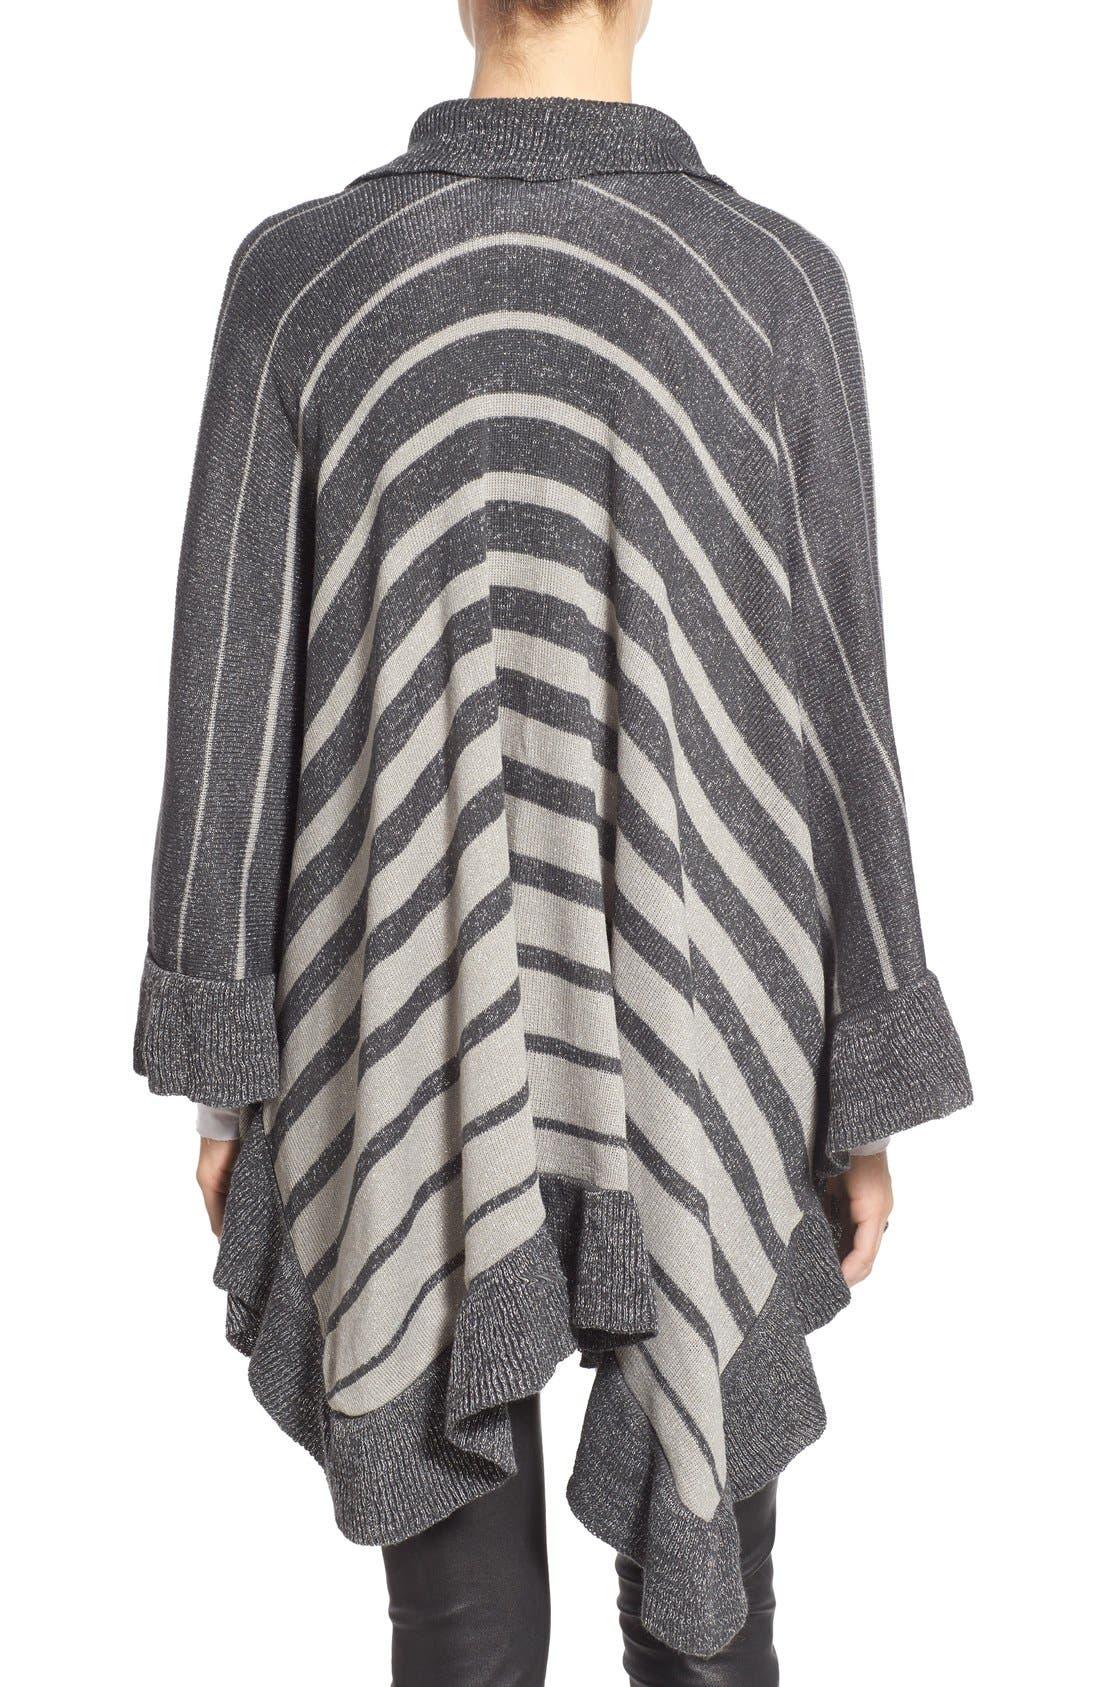 Stripe Shawl,                             Alternate thumbnail 2, color,                             Grey/ Ivory